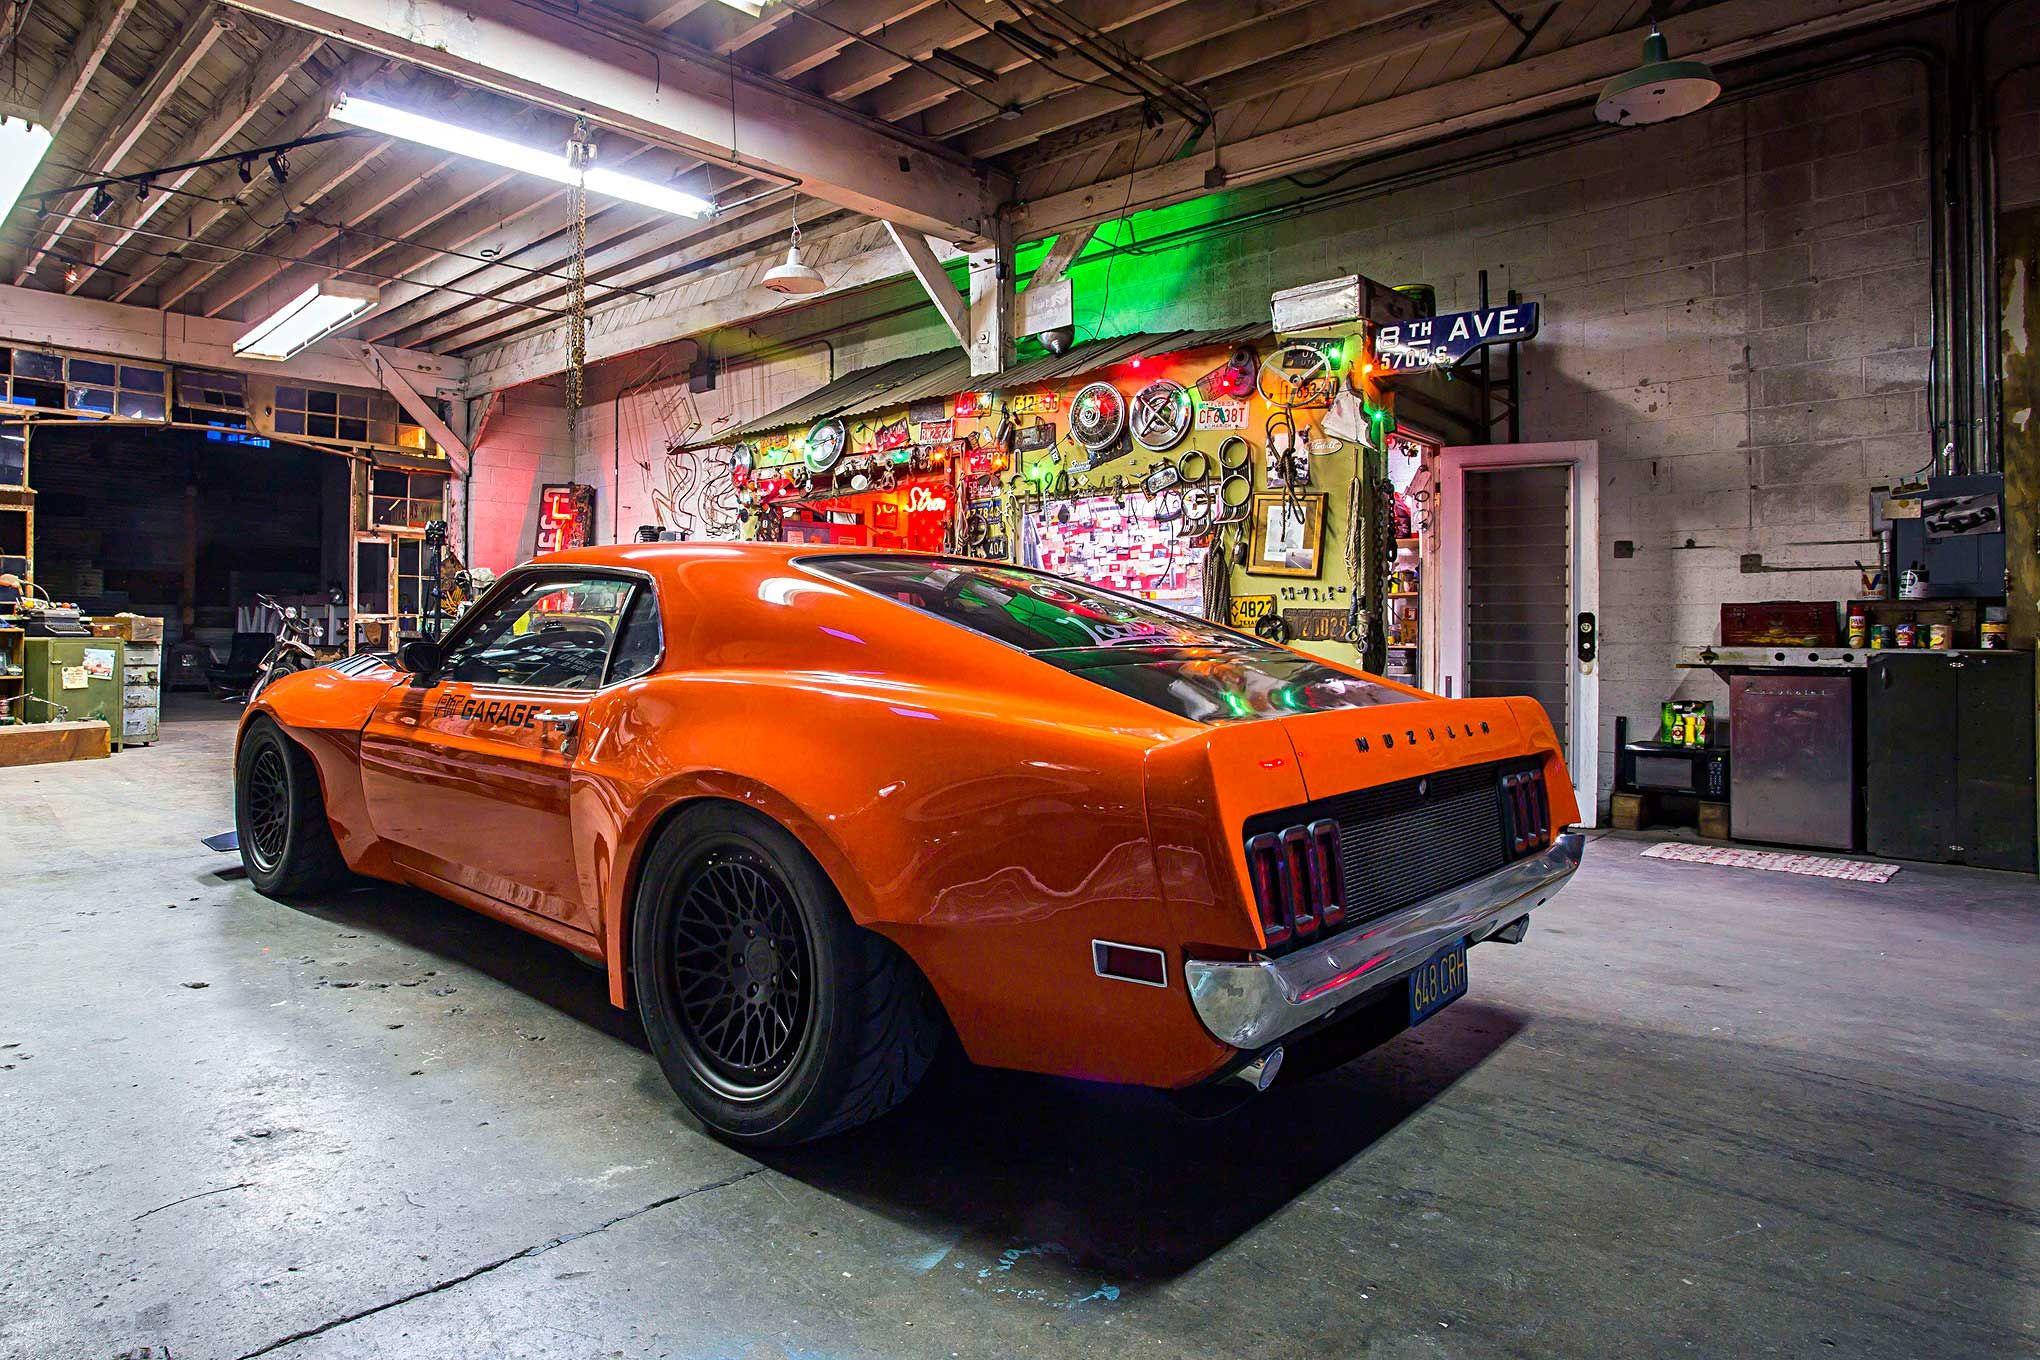 Снаружи мустанг - внутри Годзилла!!! - 1970 Ford Mustang